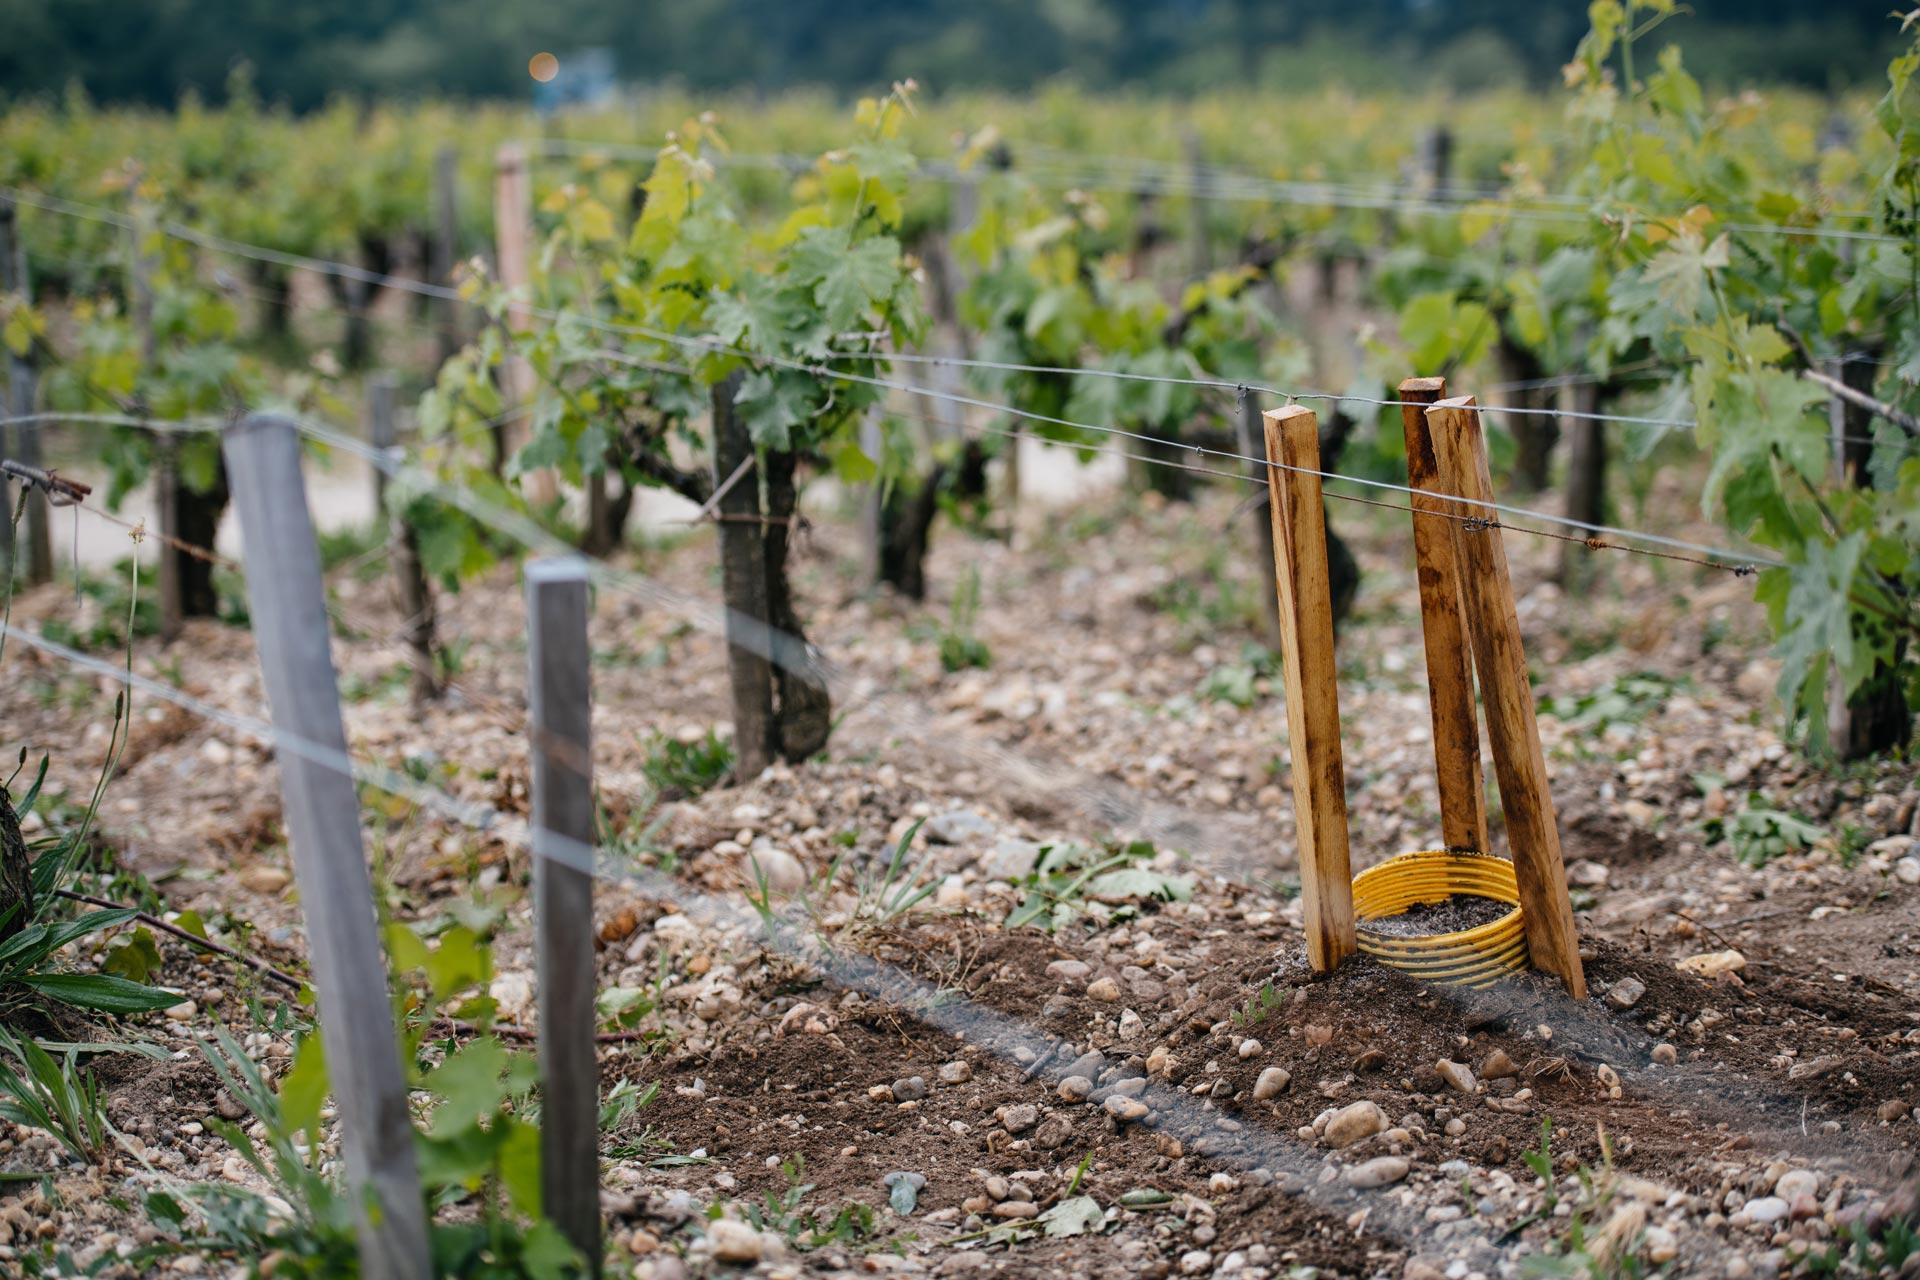 Innseto a spacco | Château Pontet-Canet | Pauillac | Bordeaux